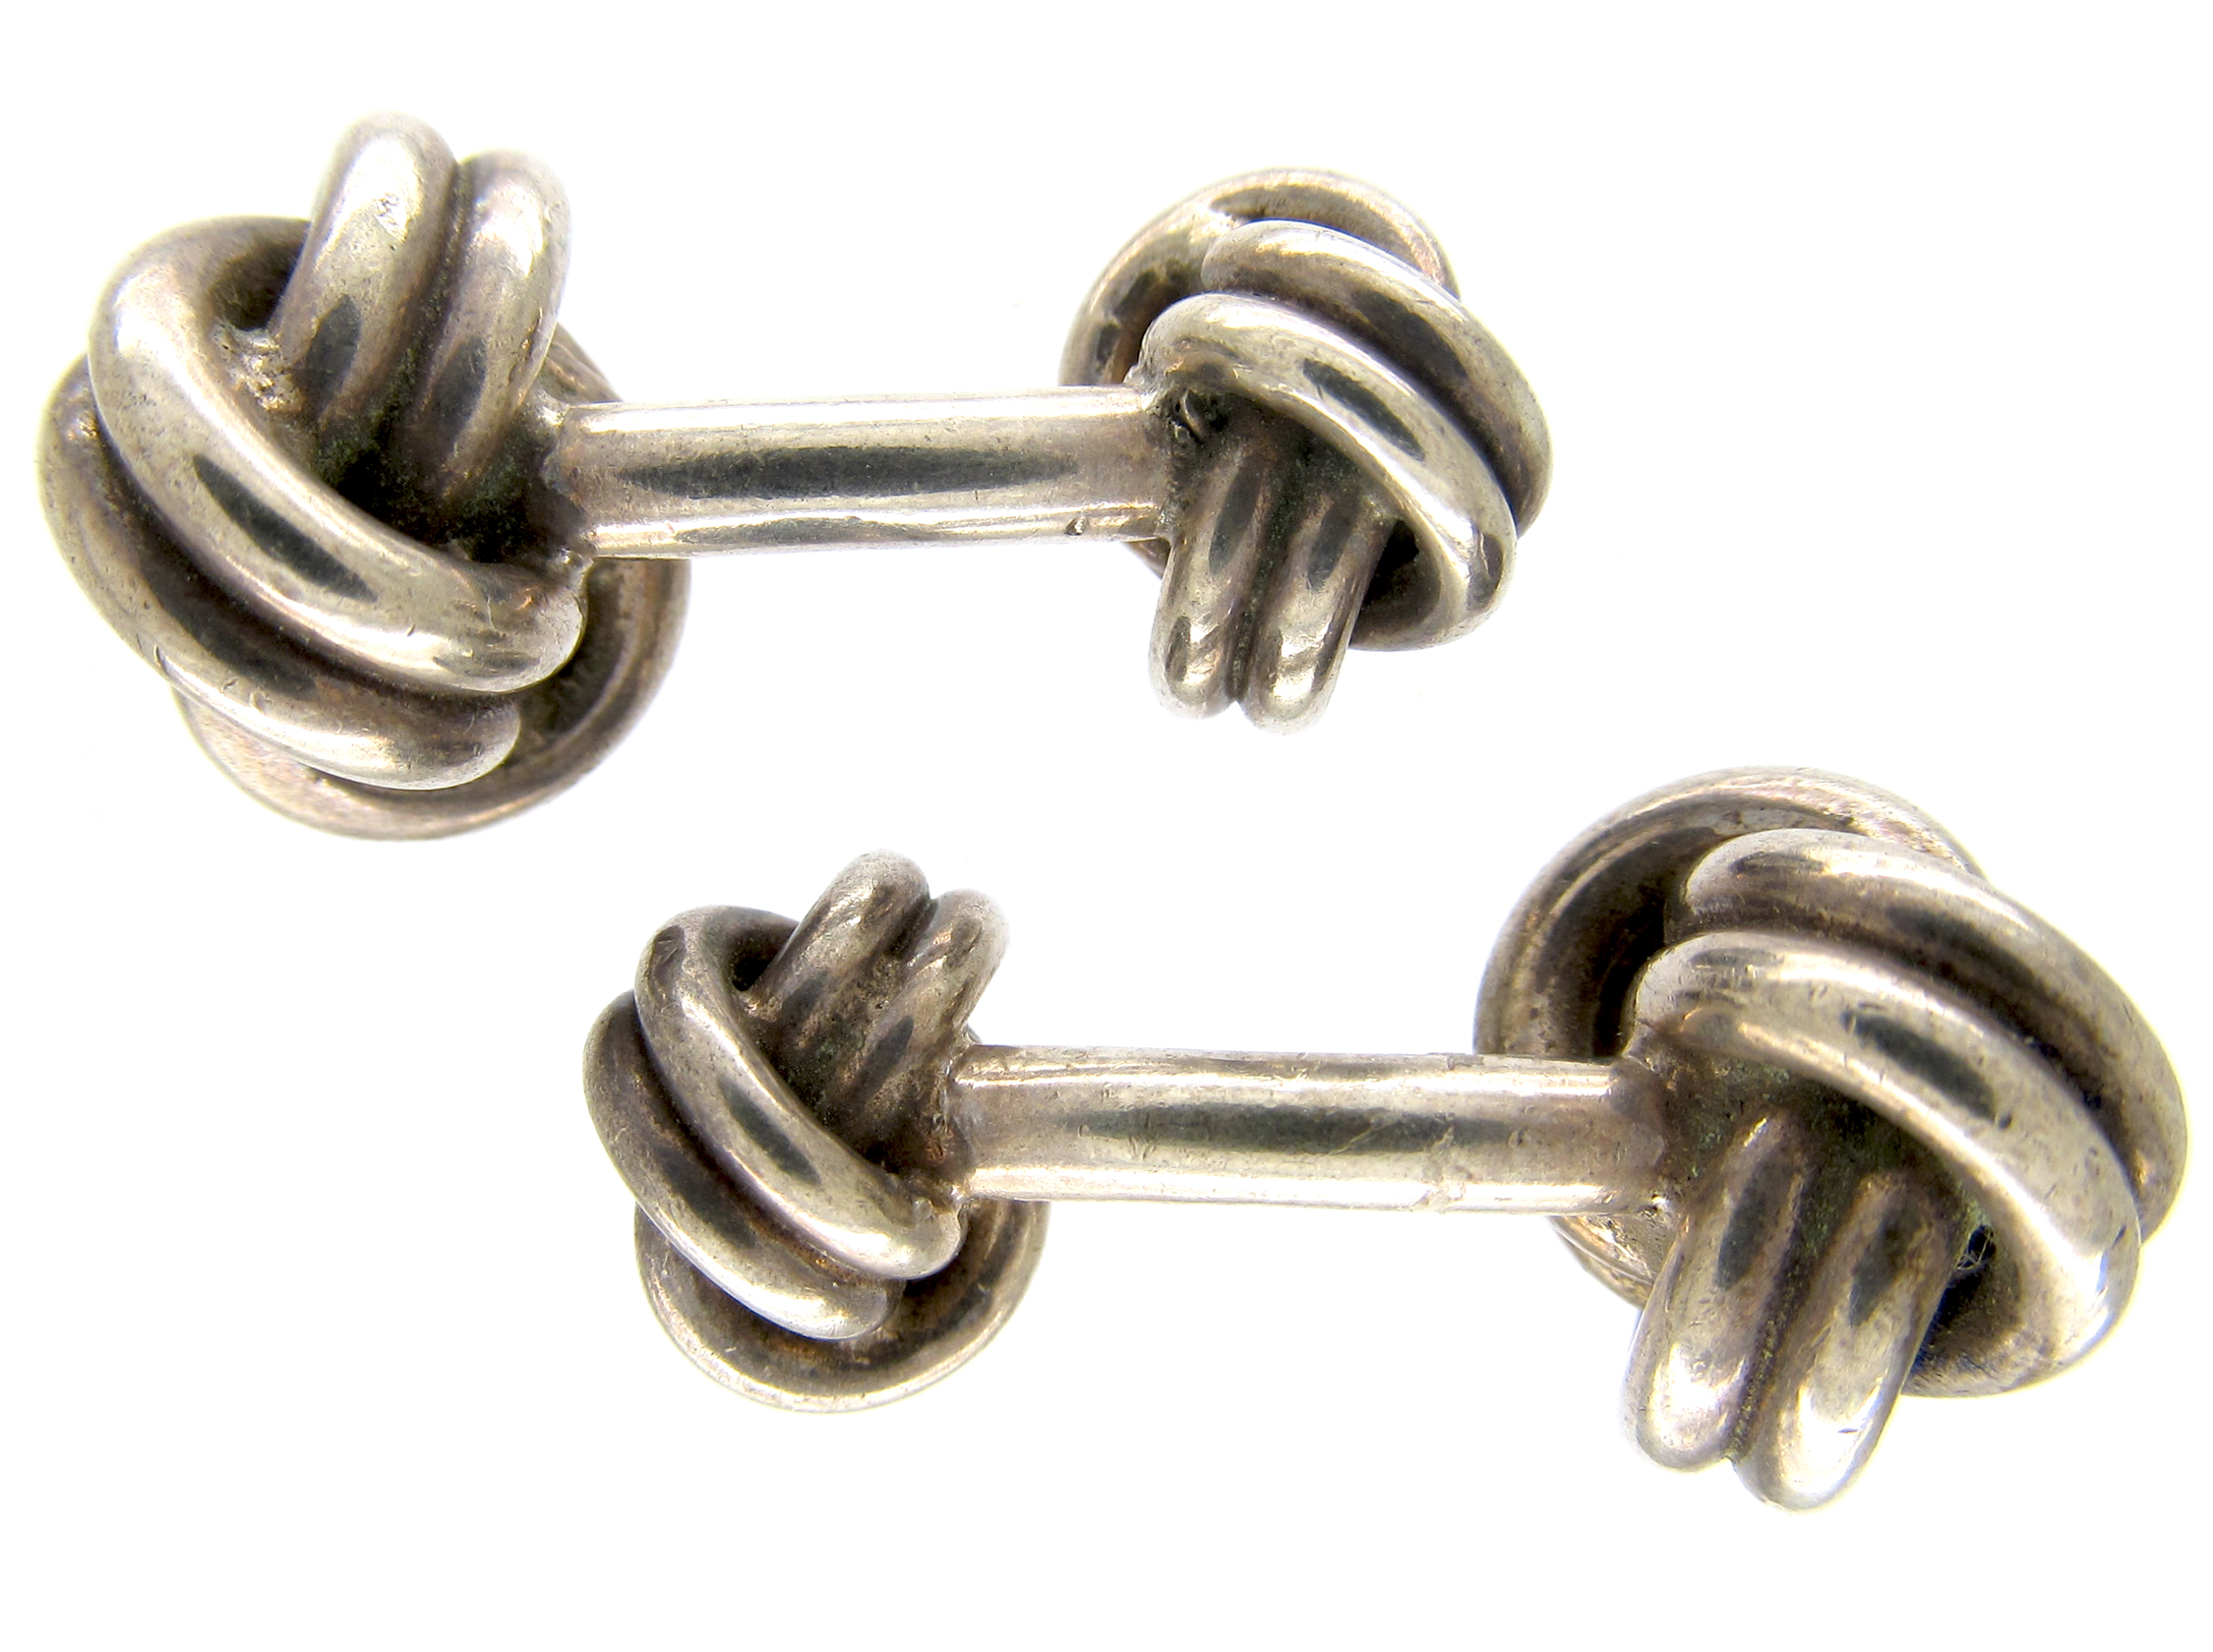 Tiffany & Co. Silver Knot Cufflinks